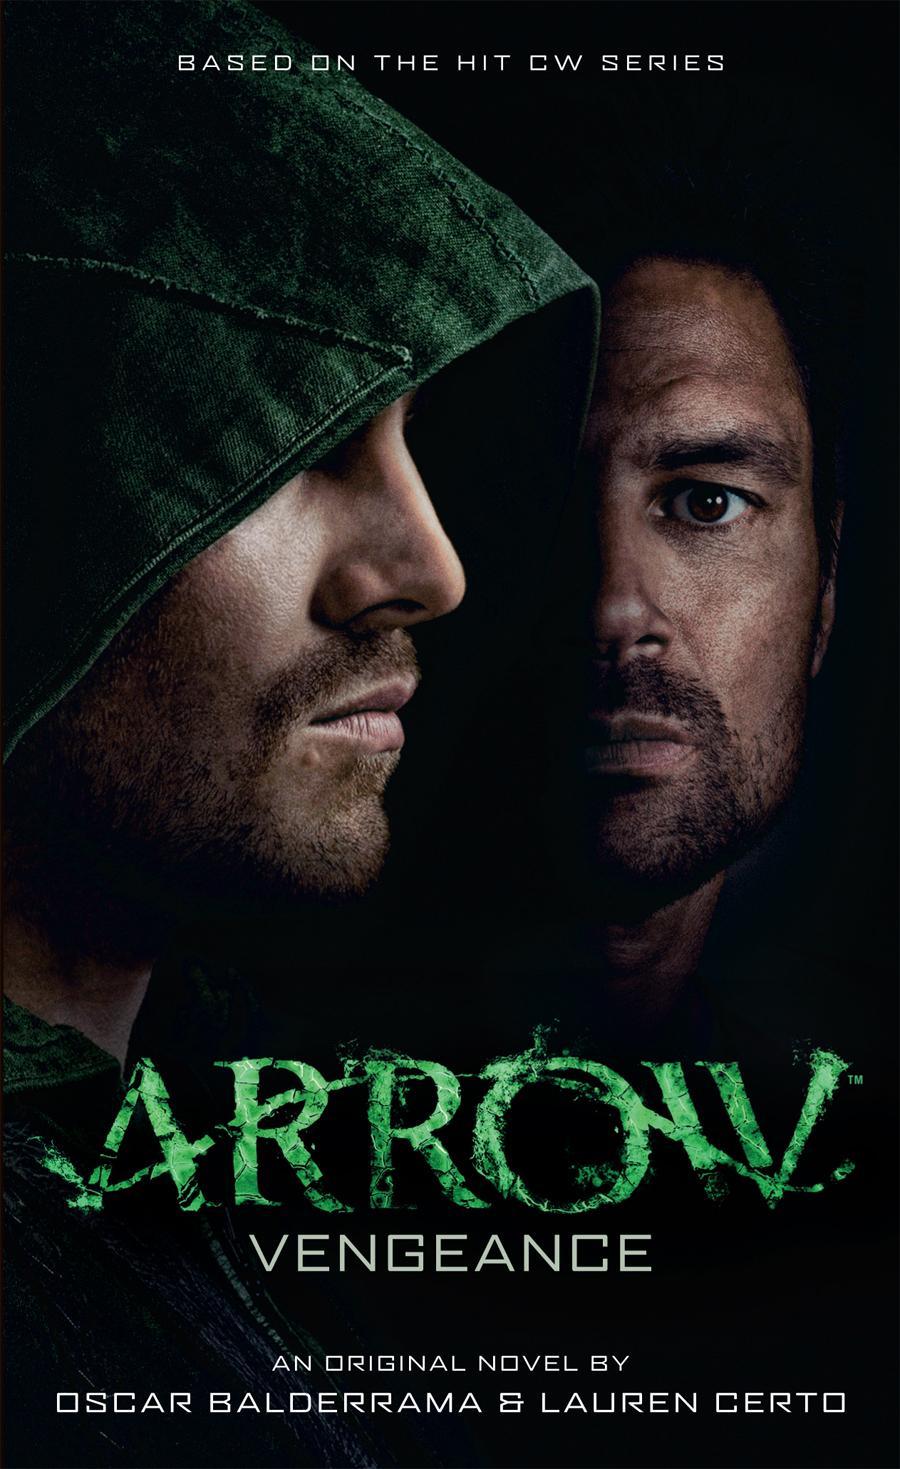 Arrow - Vengeance (Arrow novel #1) green arrow vol 1 the death and life of oliver queen rebirth